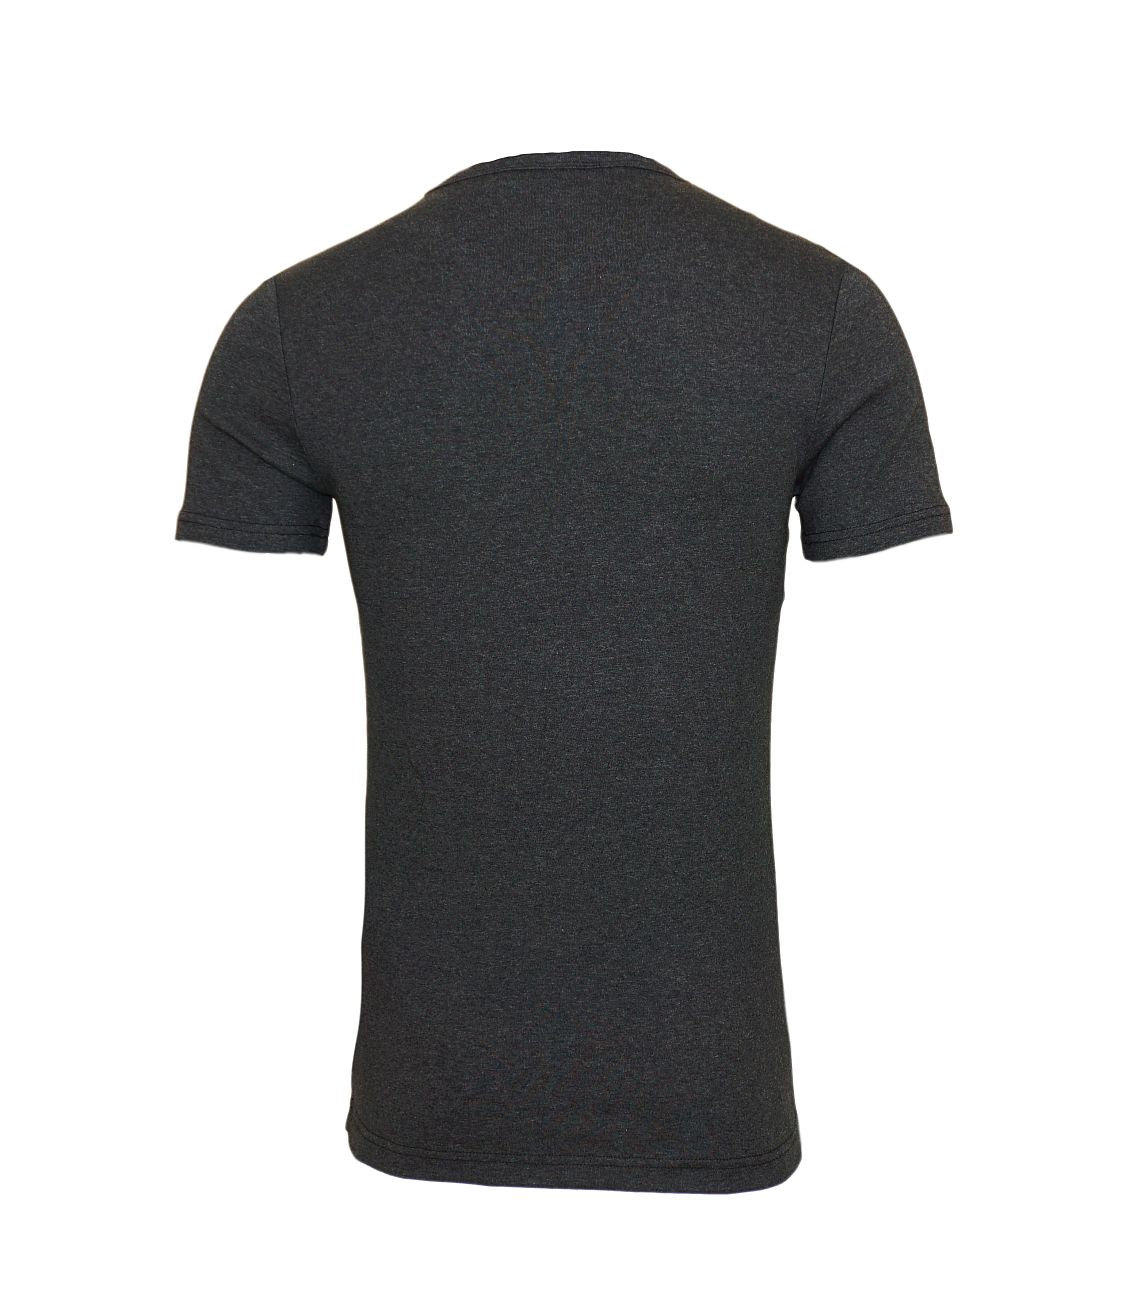 G-Star RAW T-Shirt Drillon rt D08503.1141.390 81 Black Htr F18-GST1